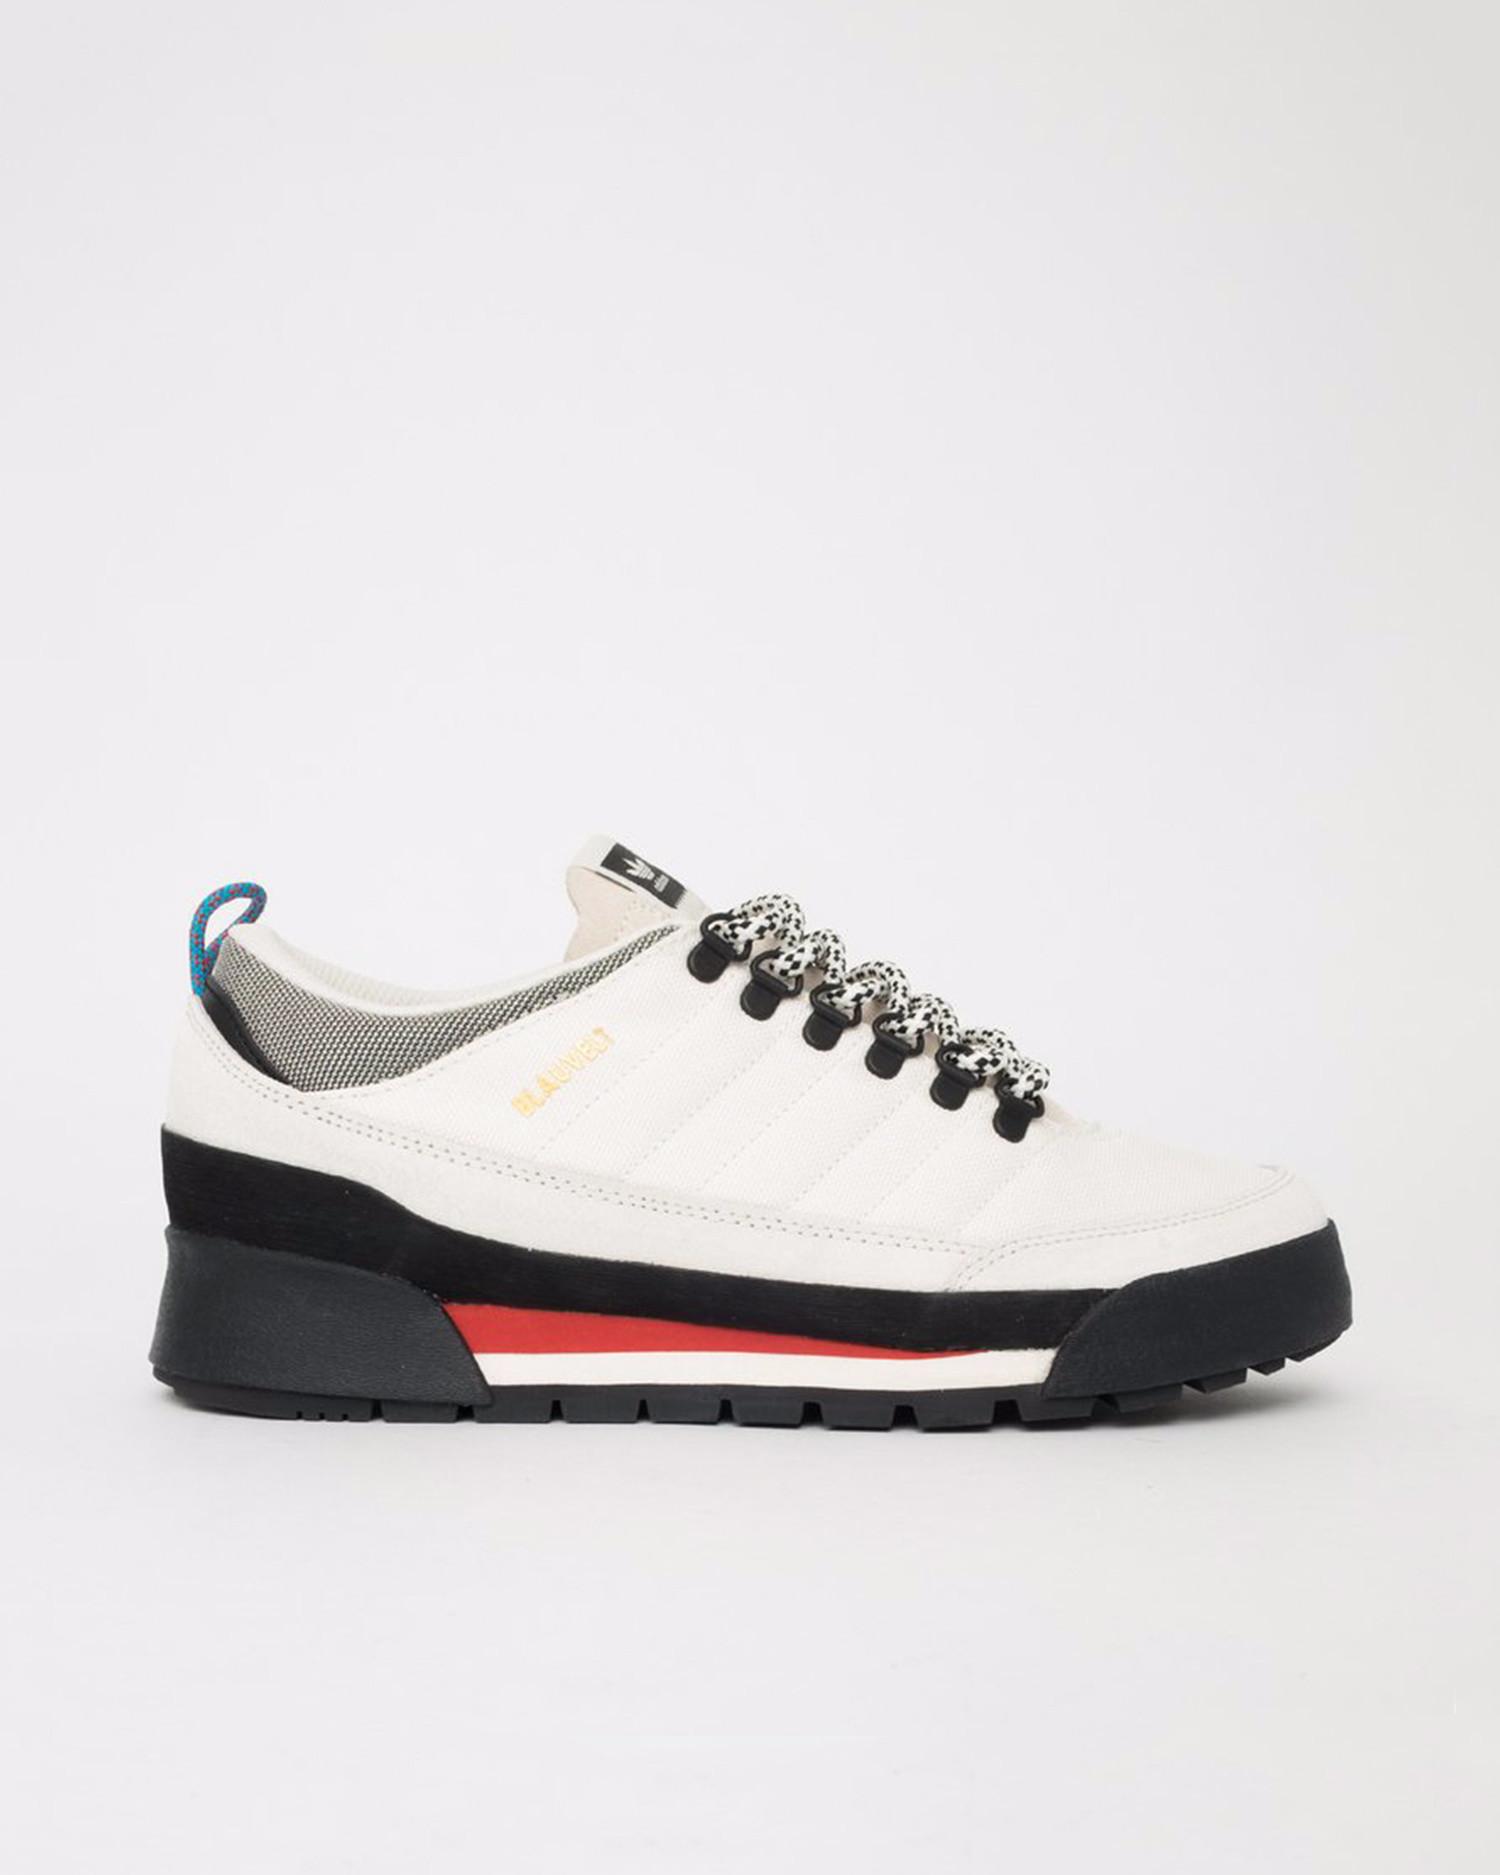 Adidas jake boot 2.0 low owhite/rawwht/cblack